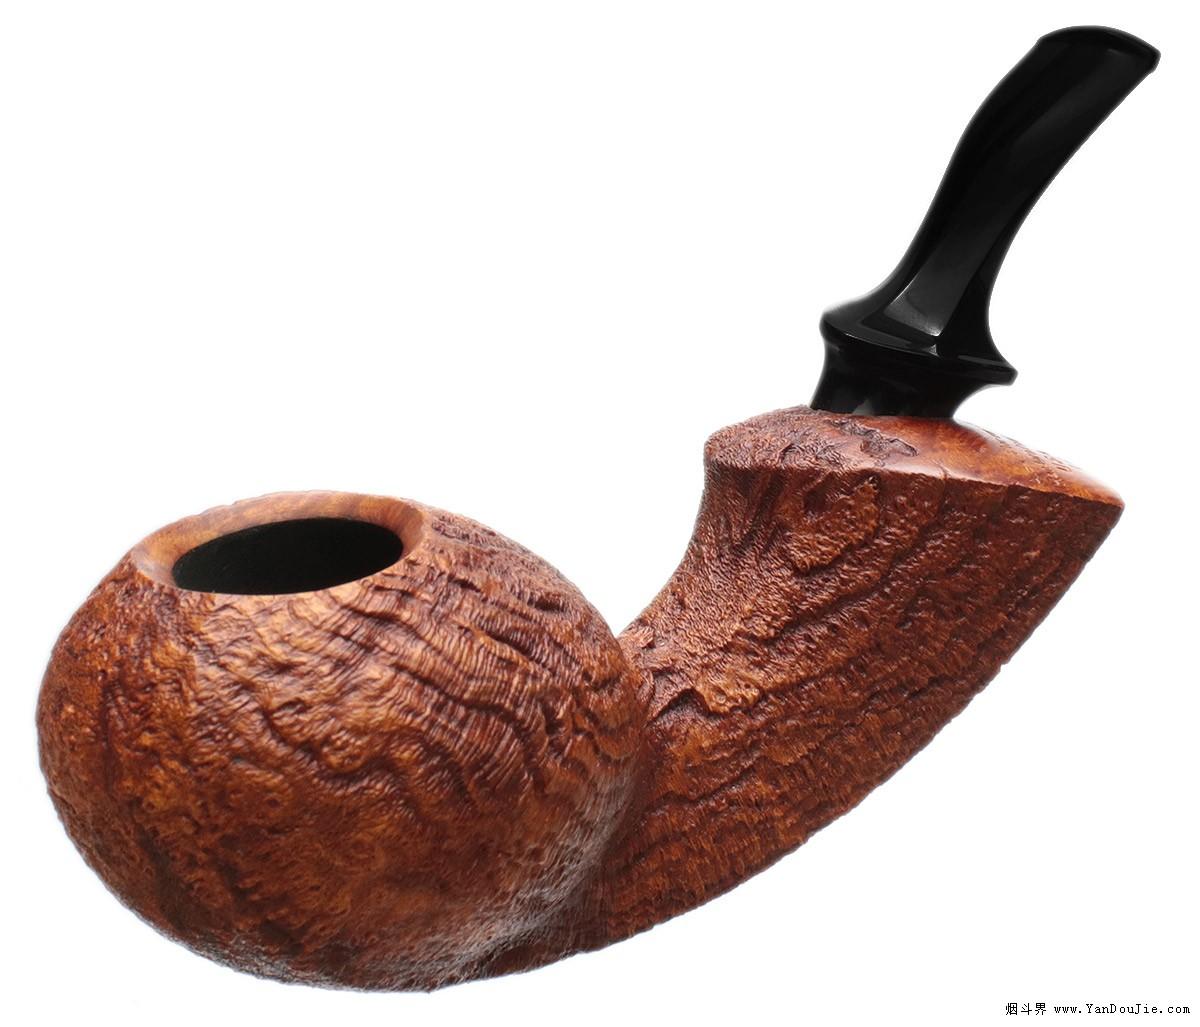 Alex Florov: 喷砂河豚鱼烟斗图